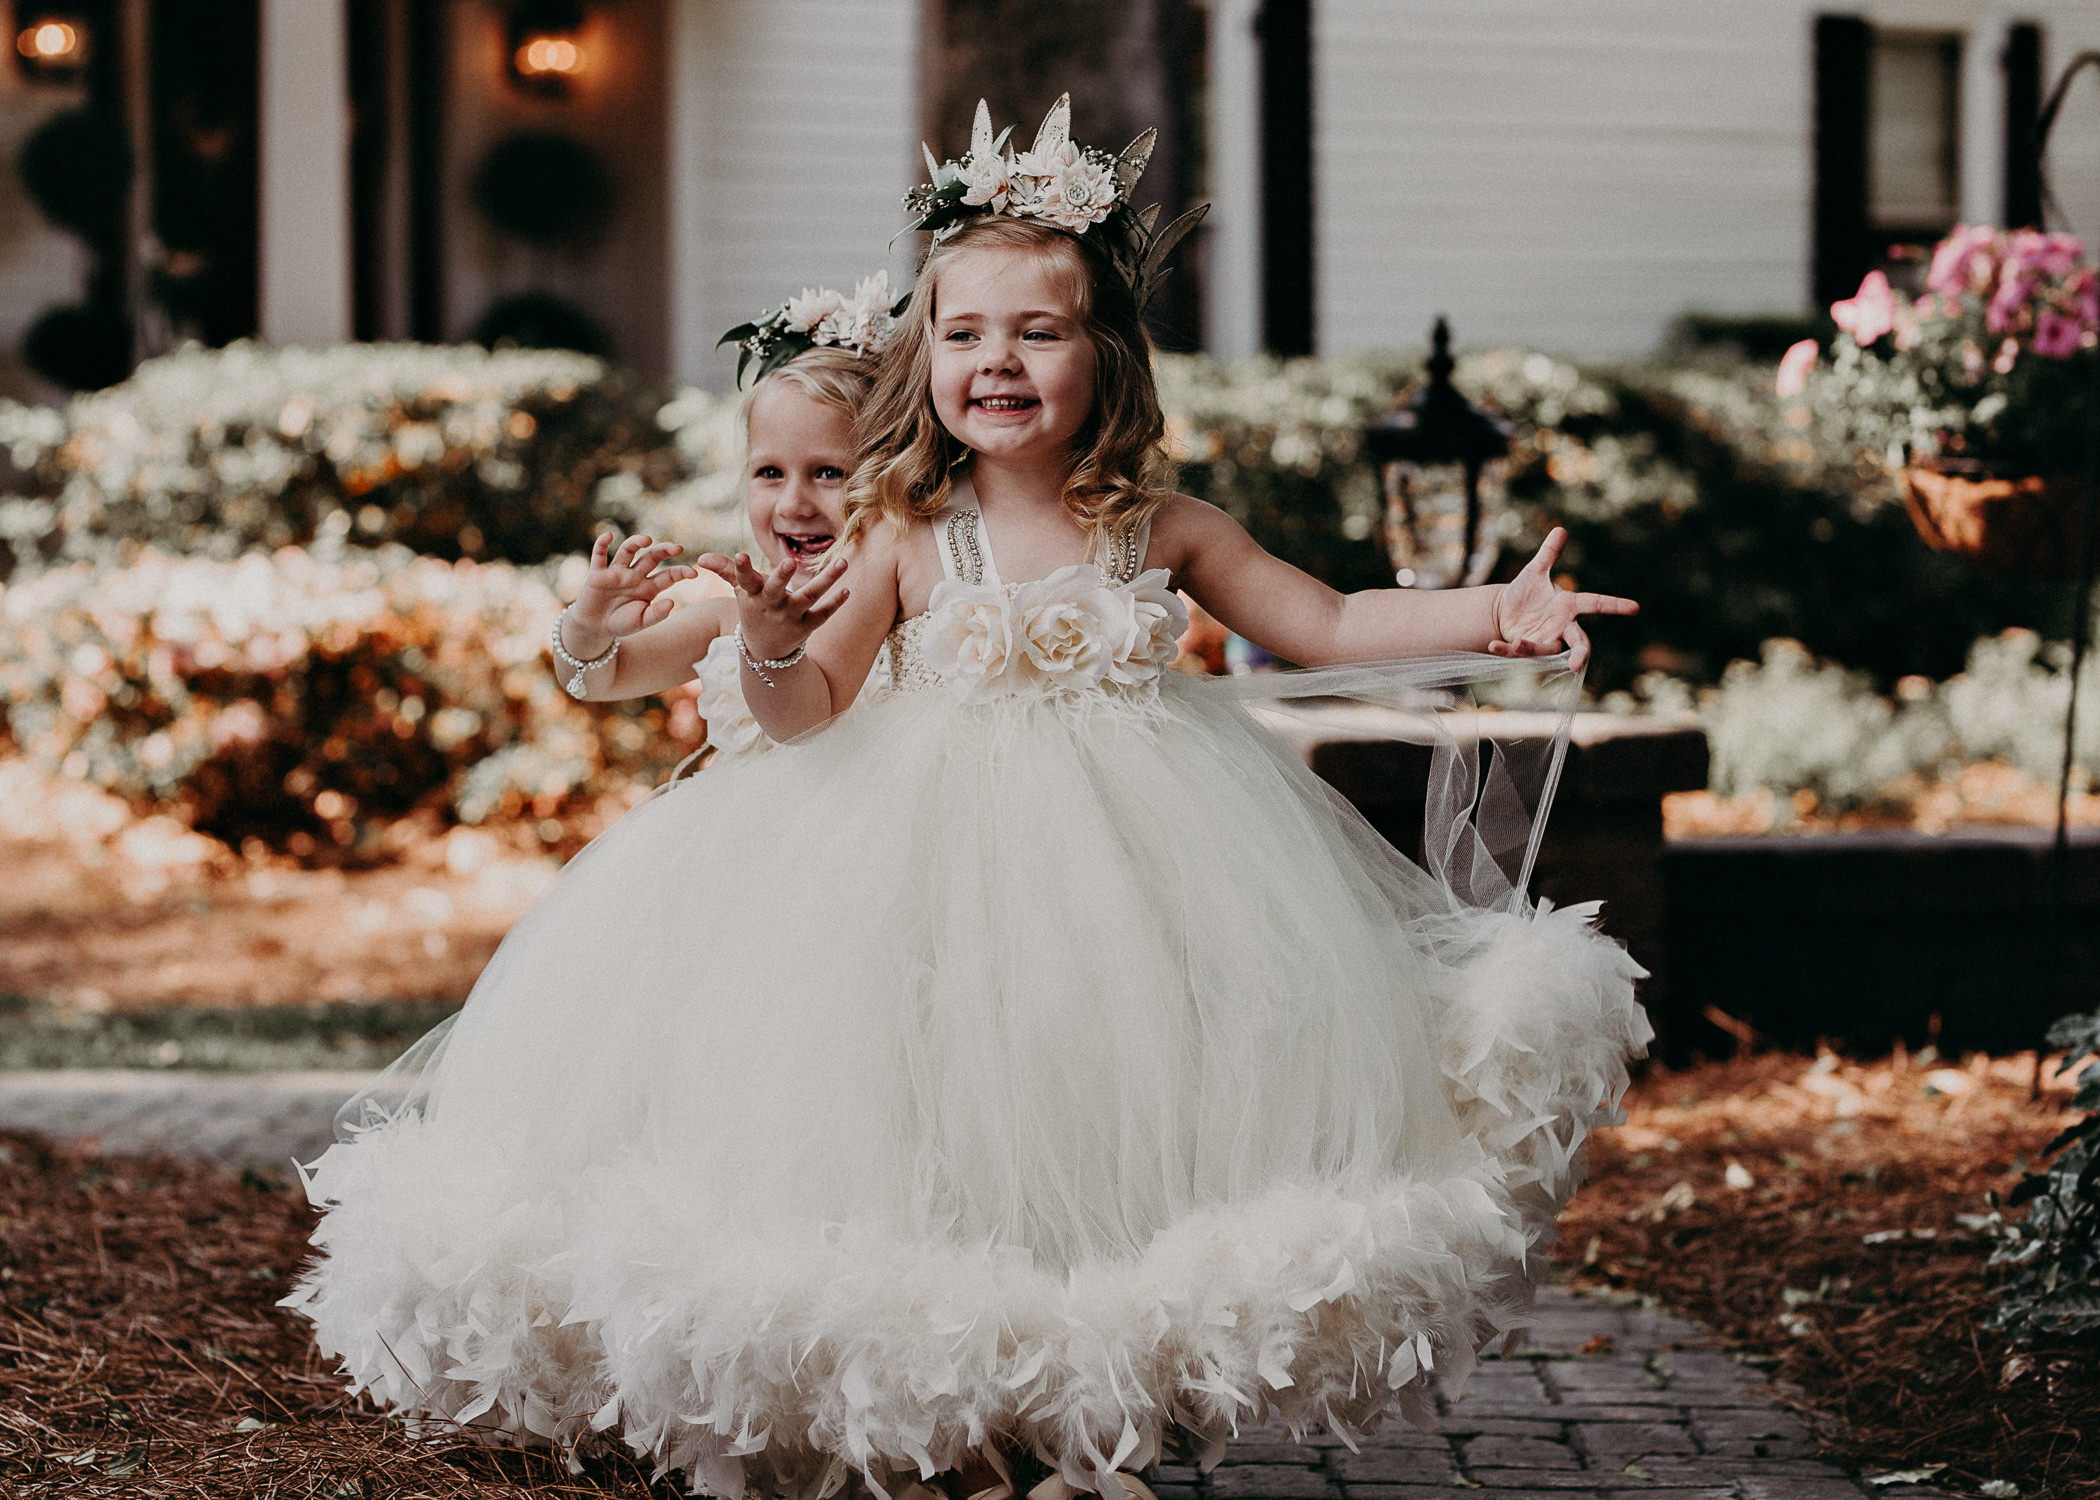 41Carl House Wedding Venue Ga, Atlanta Wedding Photographer - Boho, Bohemian, Junebug Weddings, Vintage, Retro, Trendy. Aline Marin Photography. .jpg